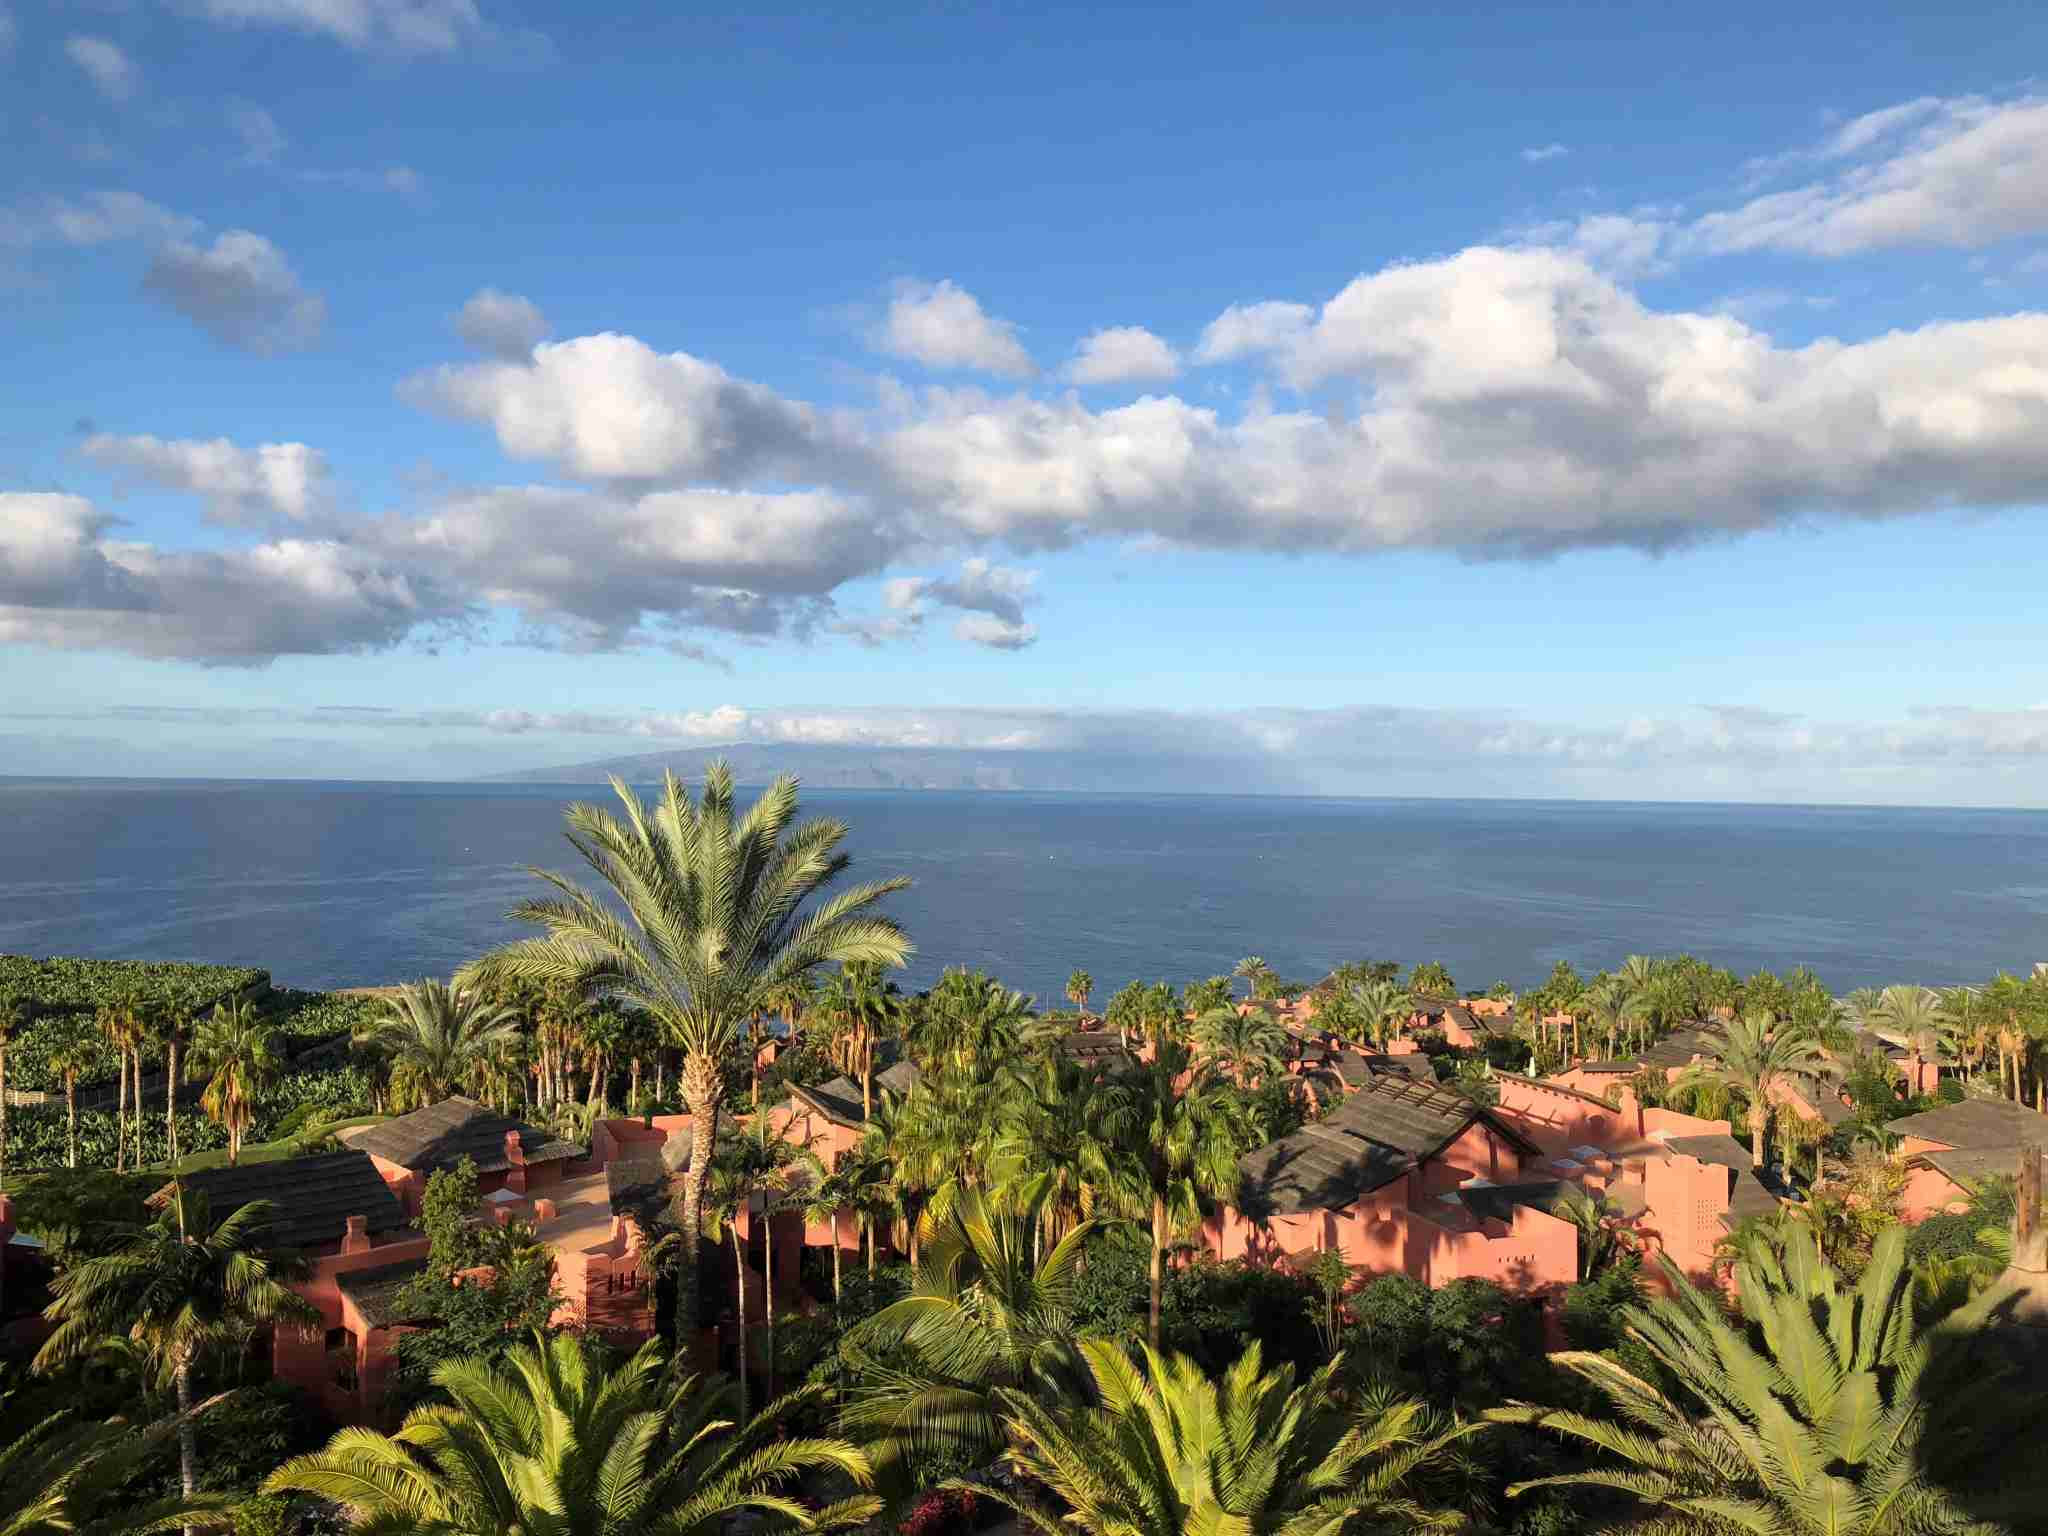 A shot of the Ritz-Carlton Tenerife in November 2018. Photo by Lori Zaino/The Points Guy